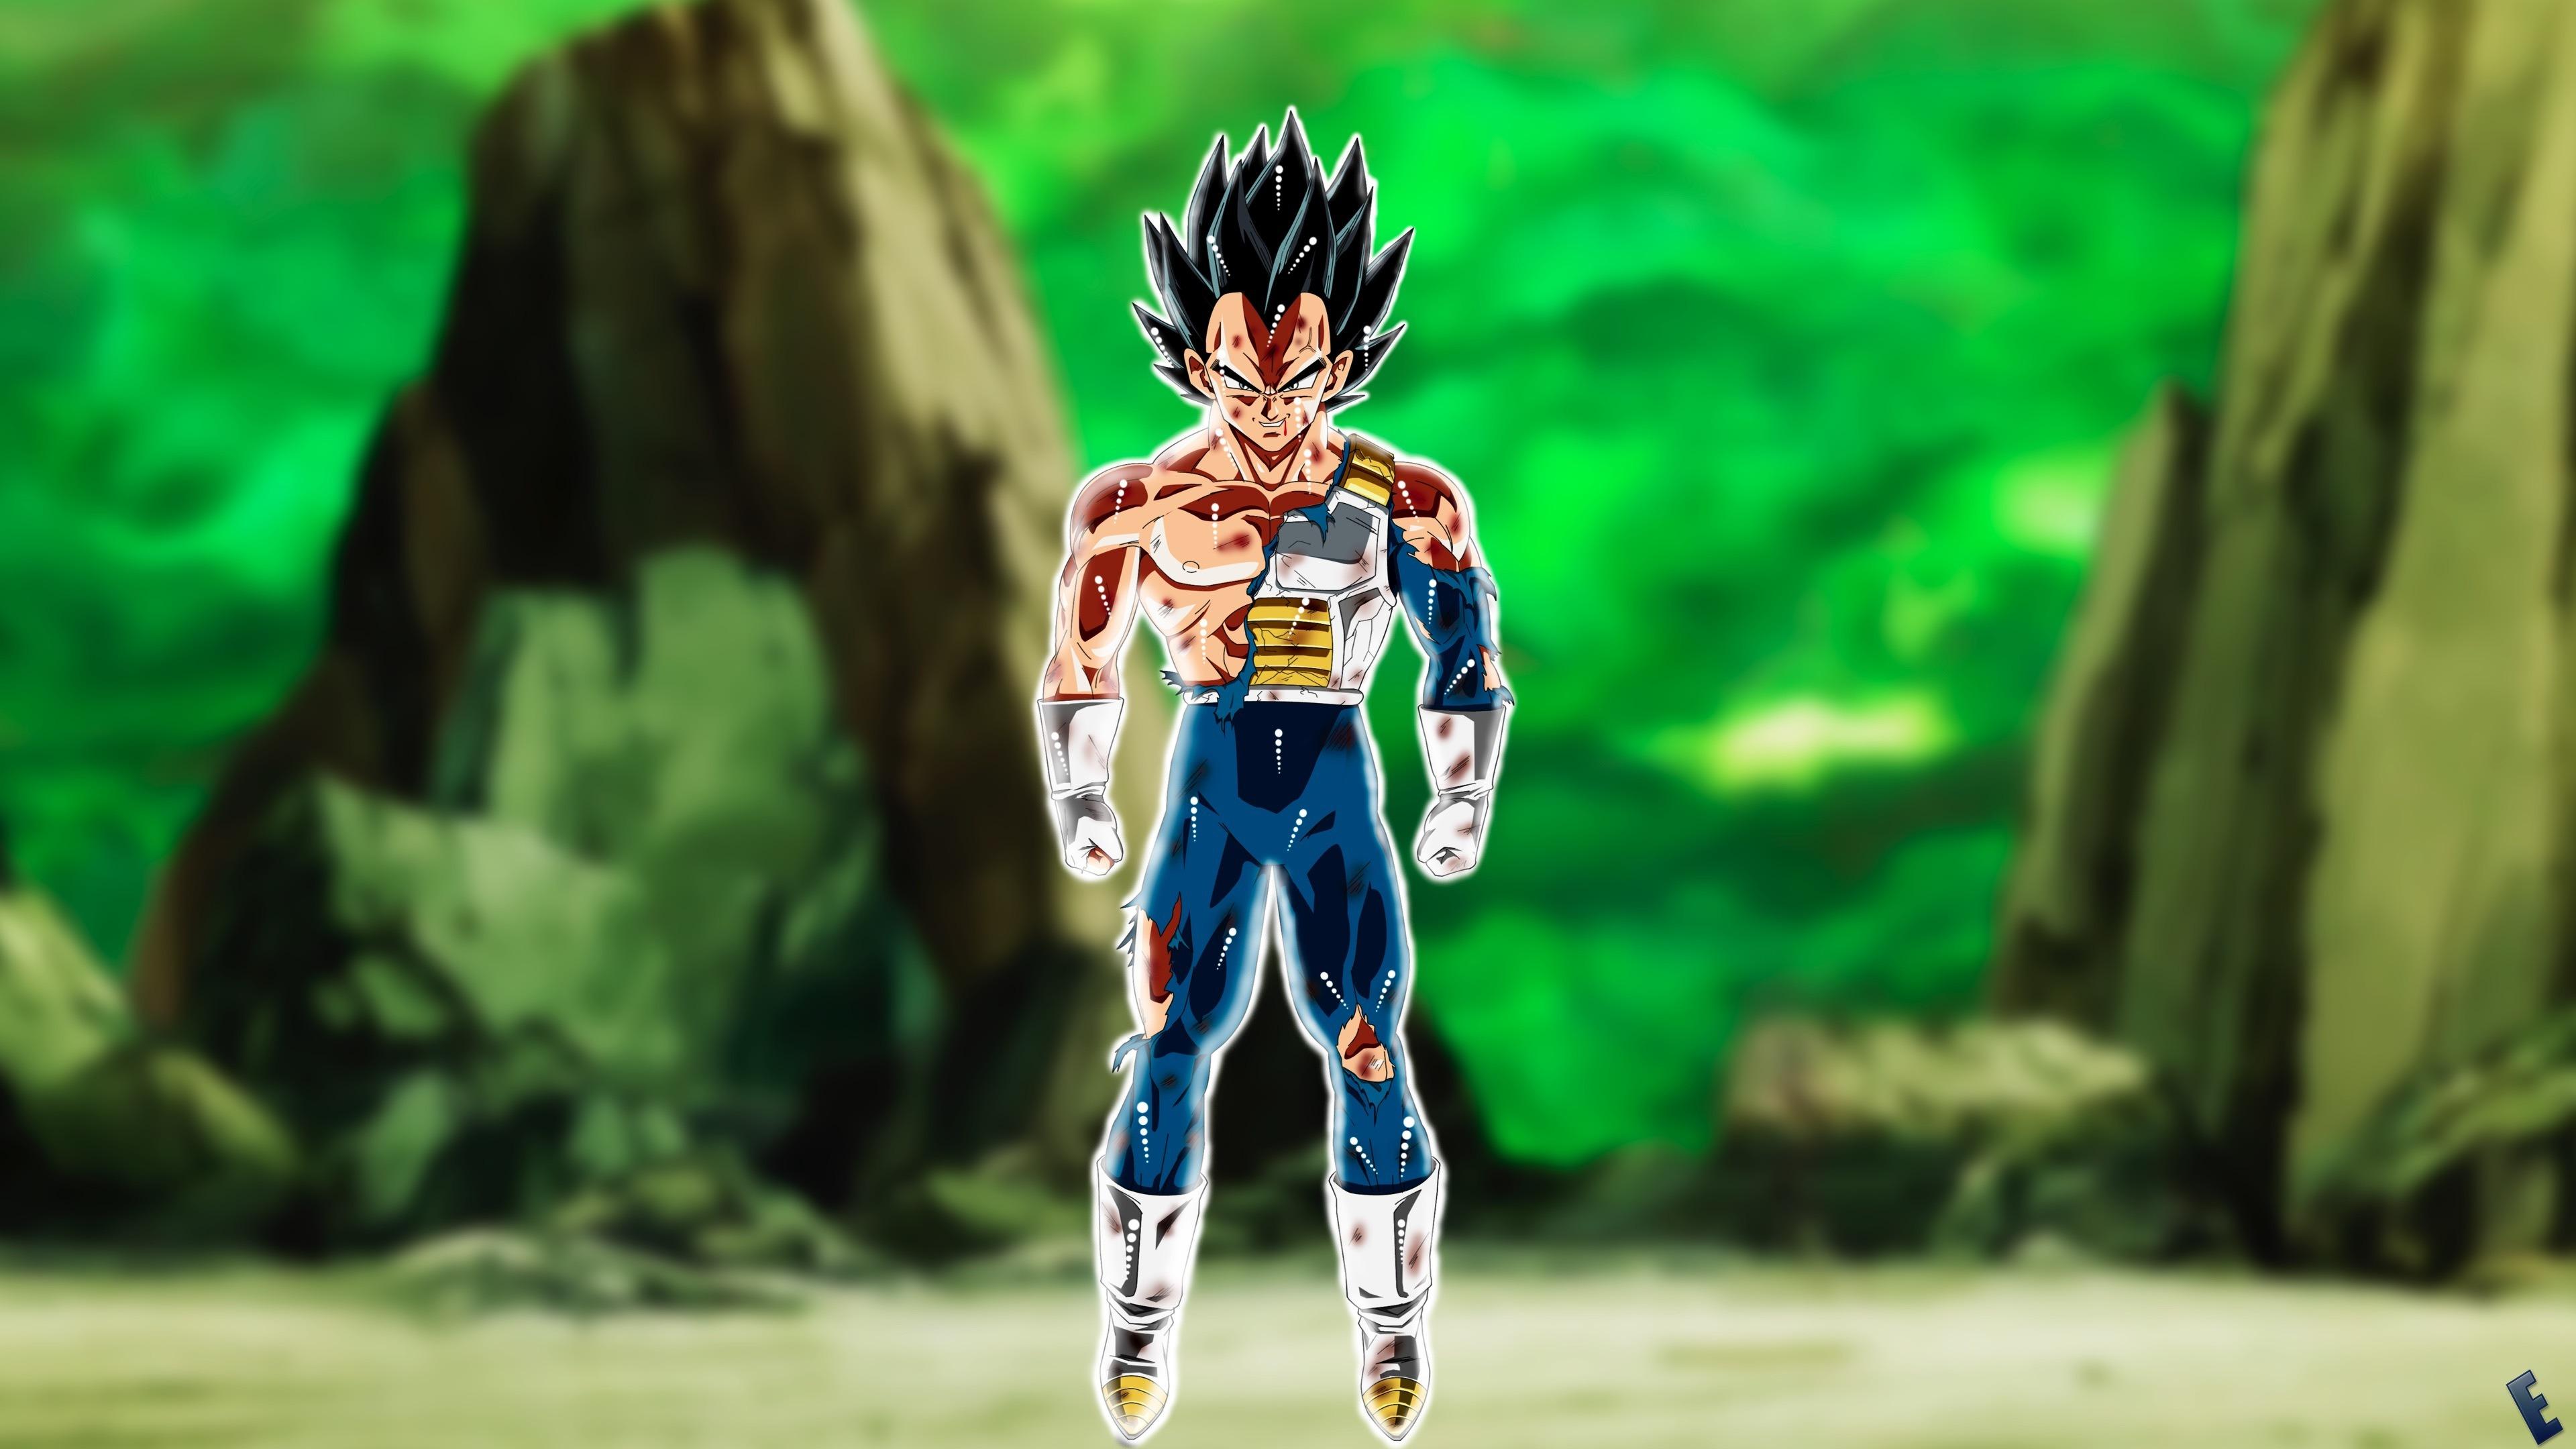 Download 3840x2400 Wallpaper Vegeta Dragon Ball Anime Boy 4k Ultra Hd 16 10 Widescreen 3840x2400 Hd Image Background 964